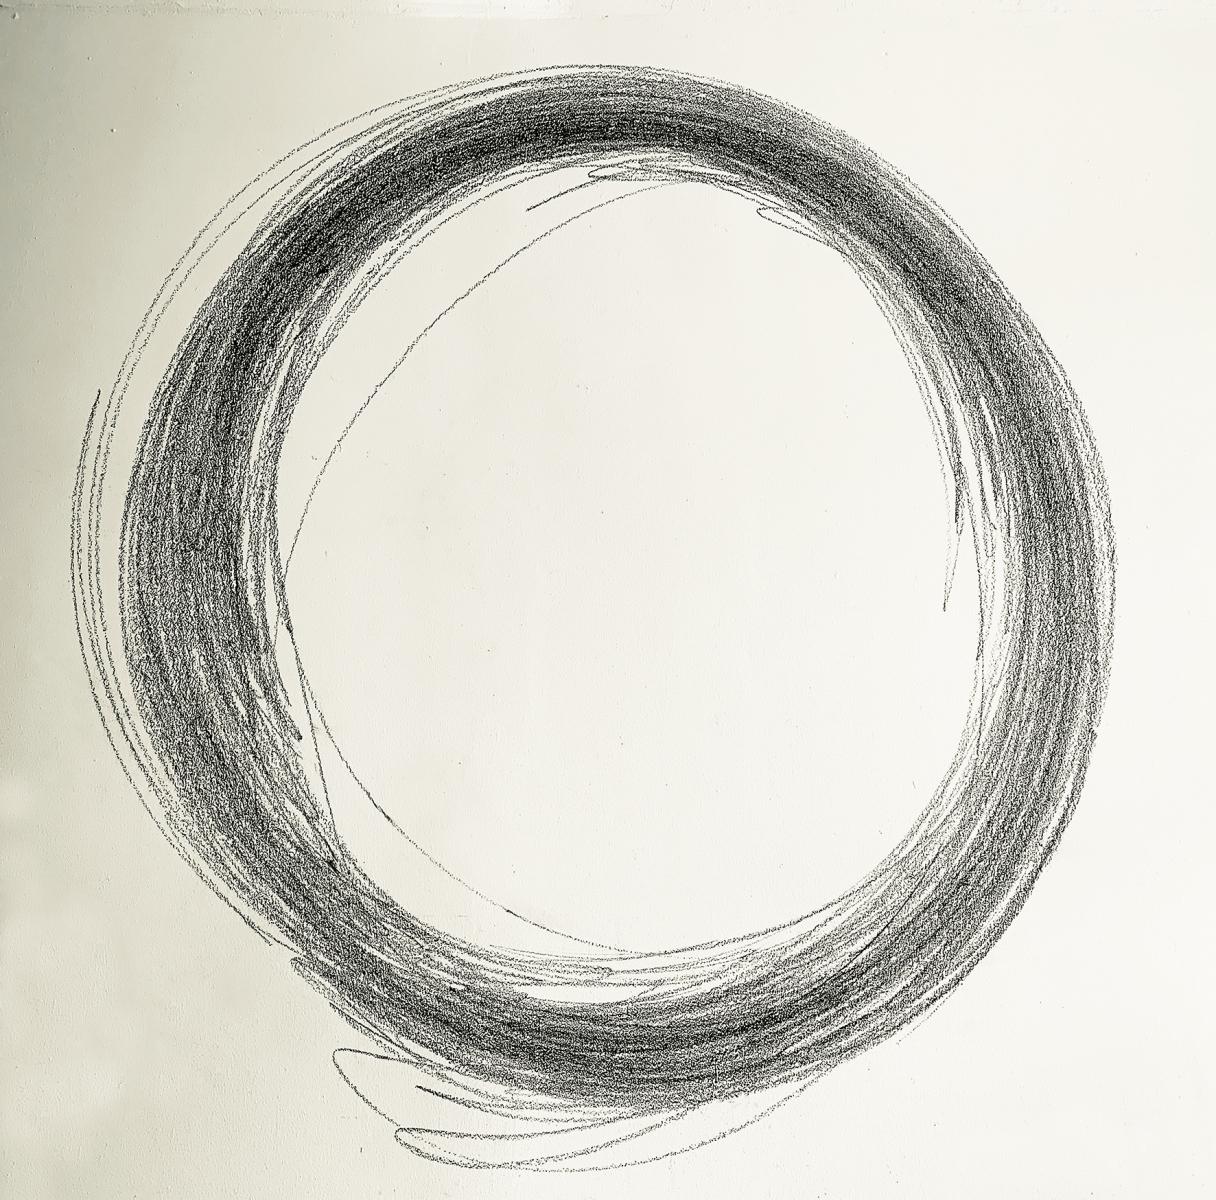 1. Cero Absoluto, 2015 - Drawing, Performance(Naivy Perez)